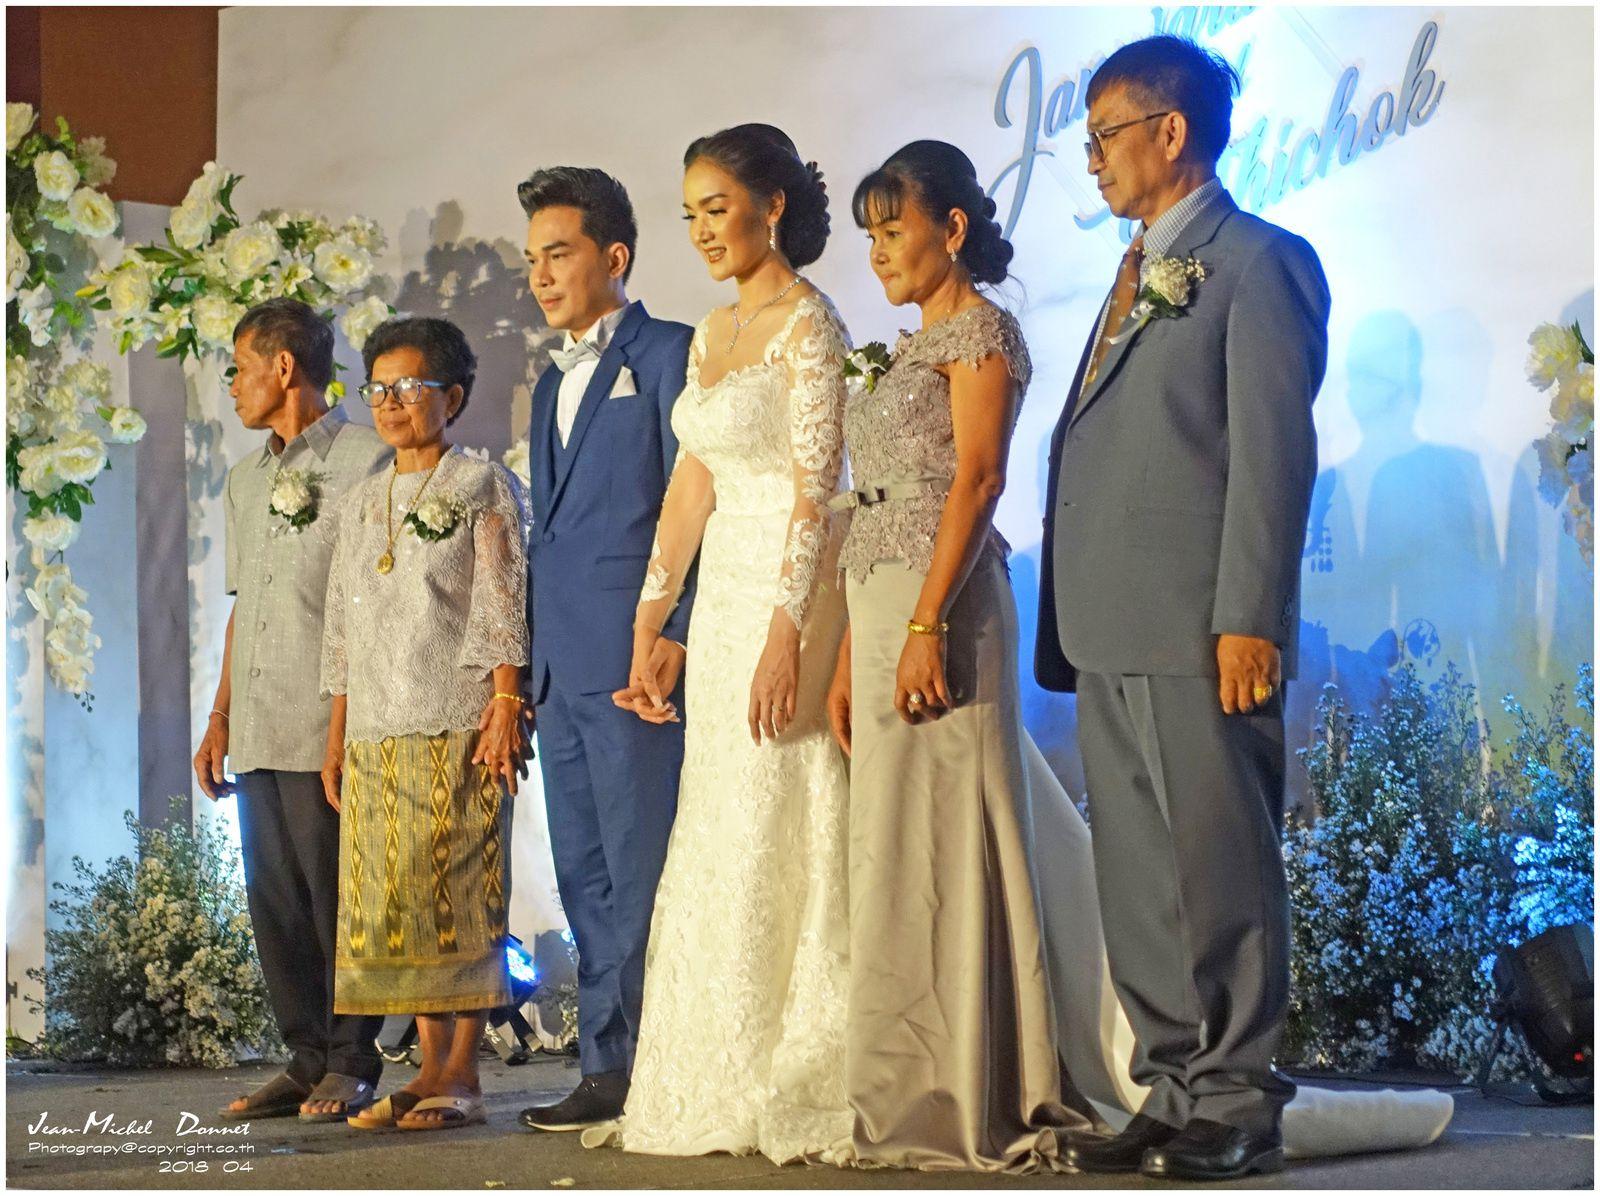 Mariage Thaï (avril 2018)